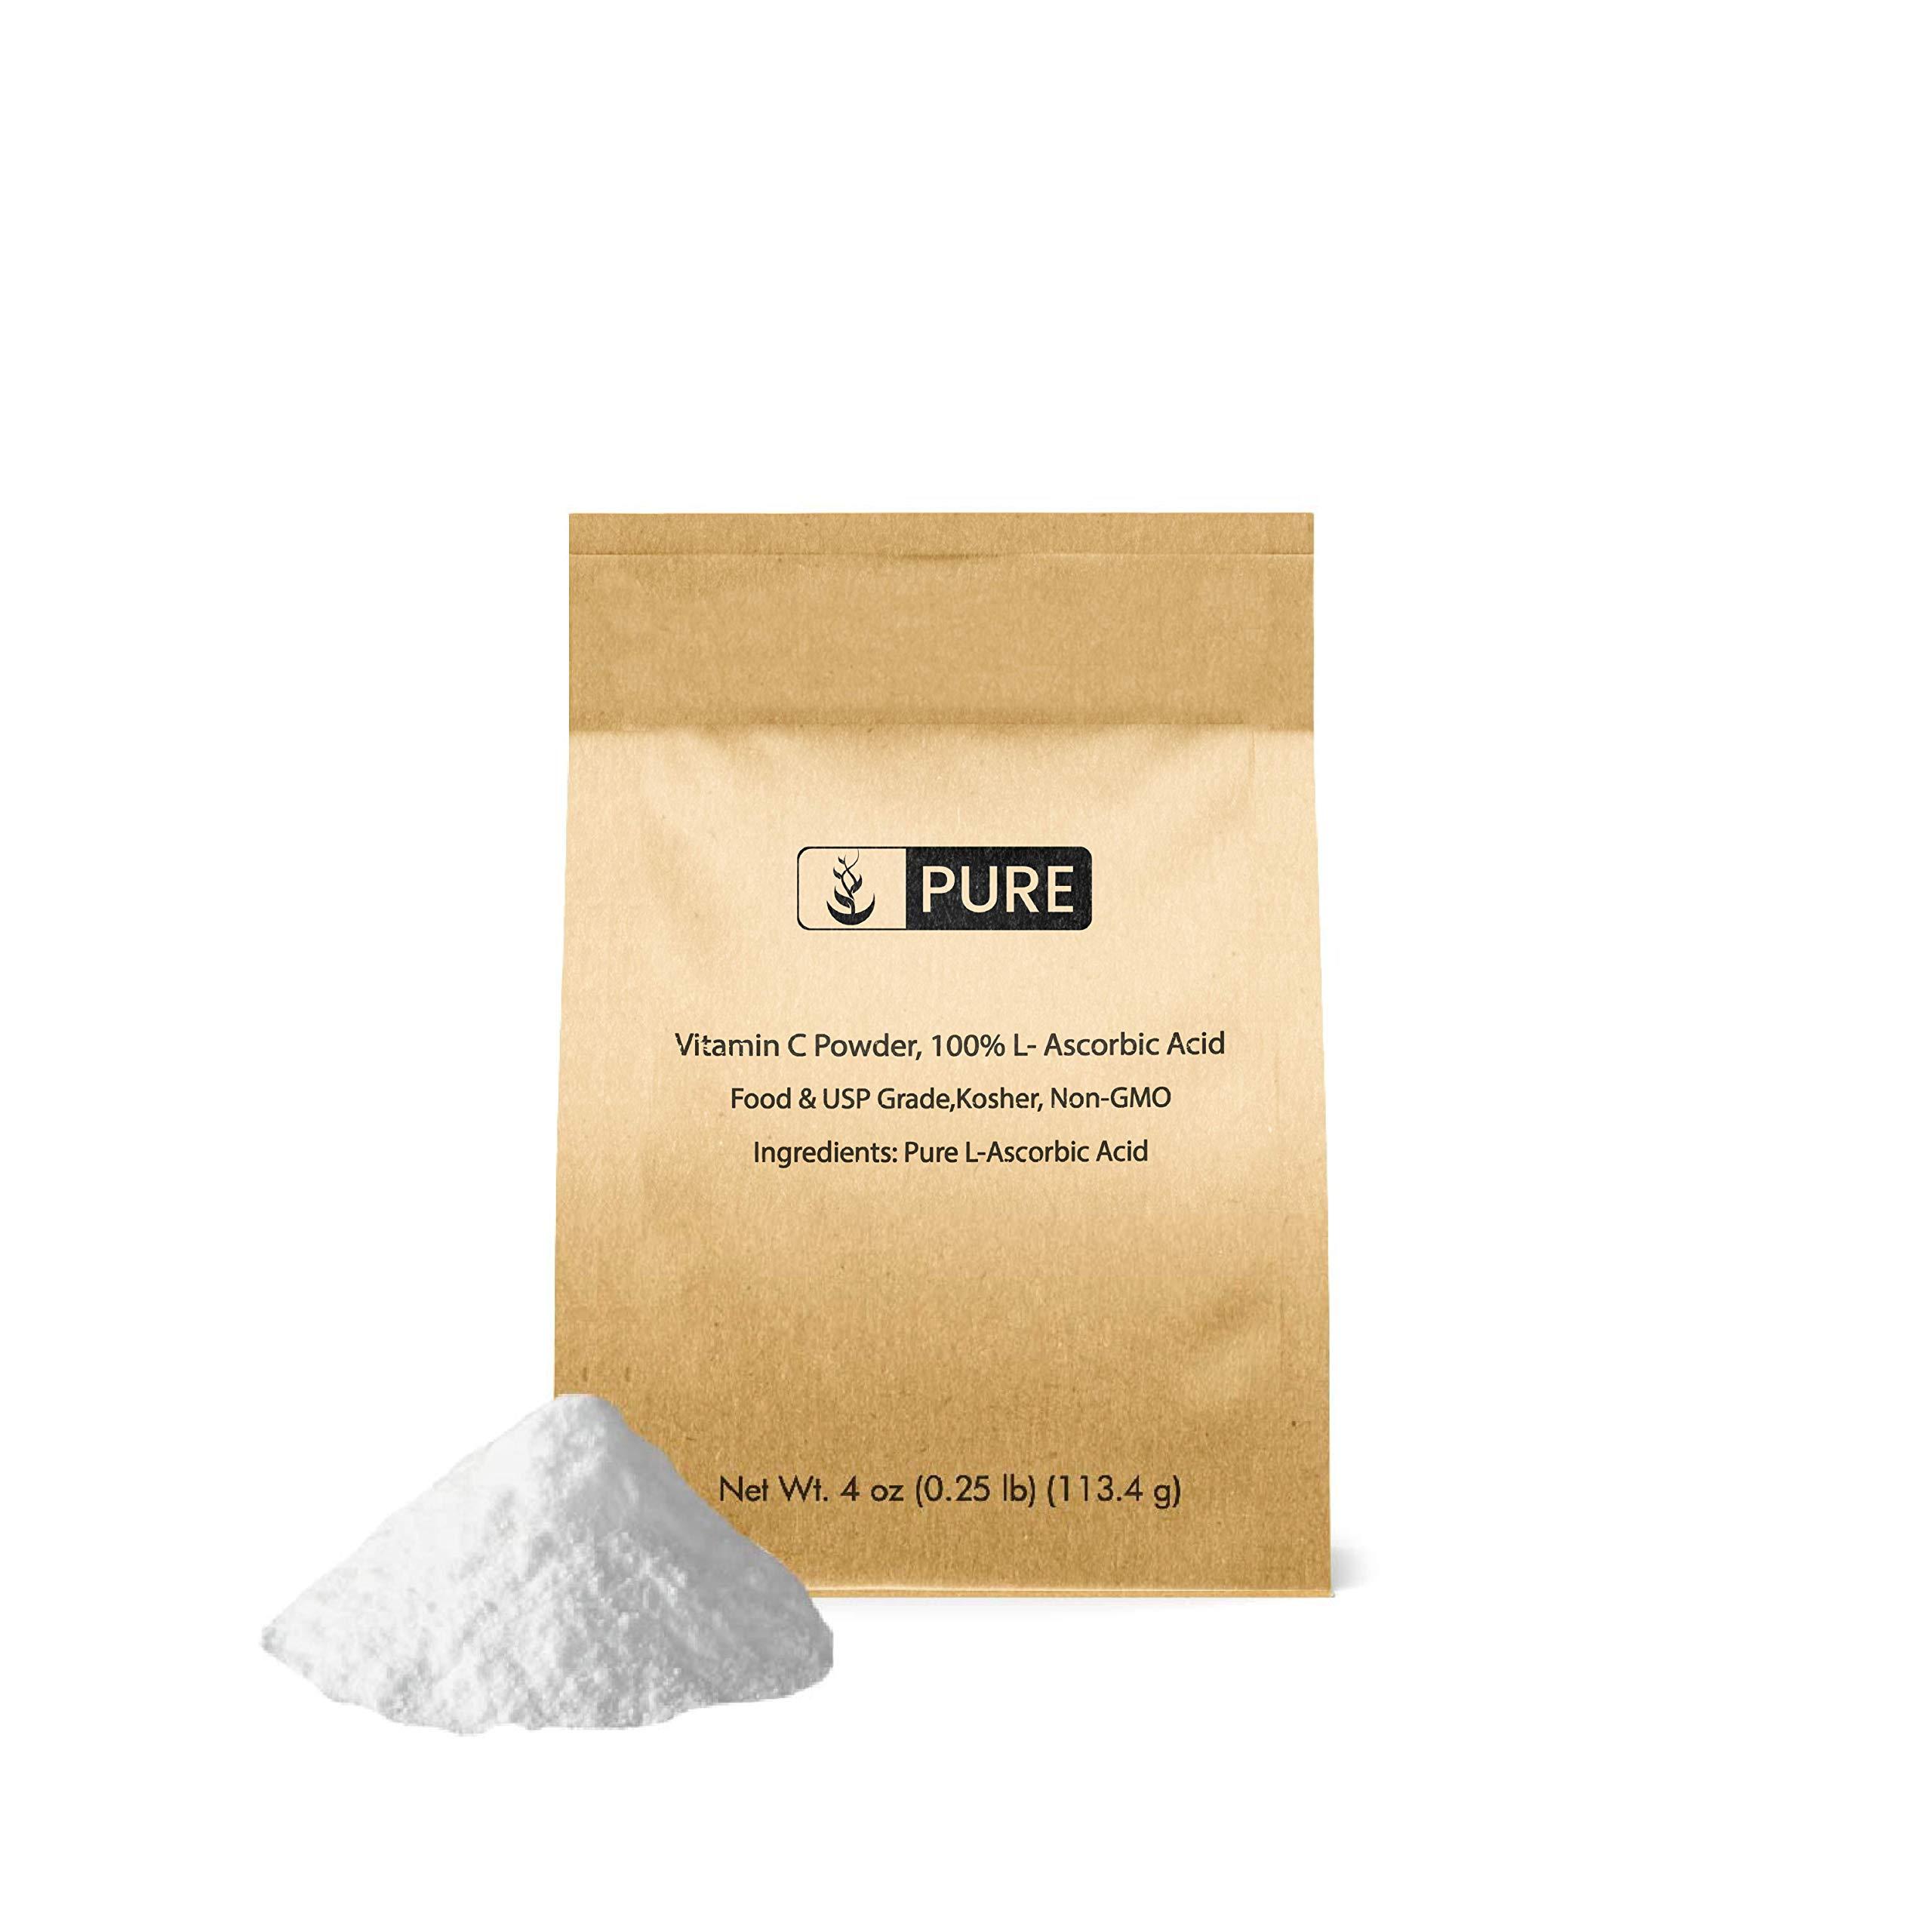 Pure Vitamin C Powder (4 oz.), Eco-Friendly Packaging, L-Ascorbic Acid, Antioxidant, Boost Immune System, DIY Skin Care